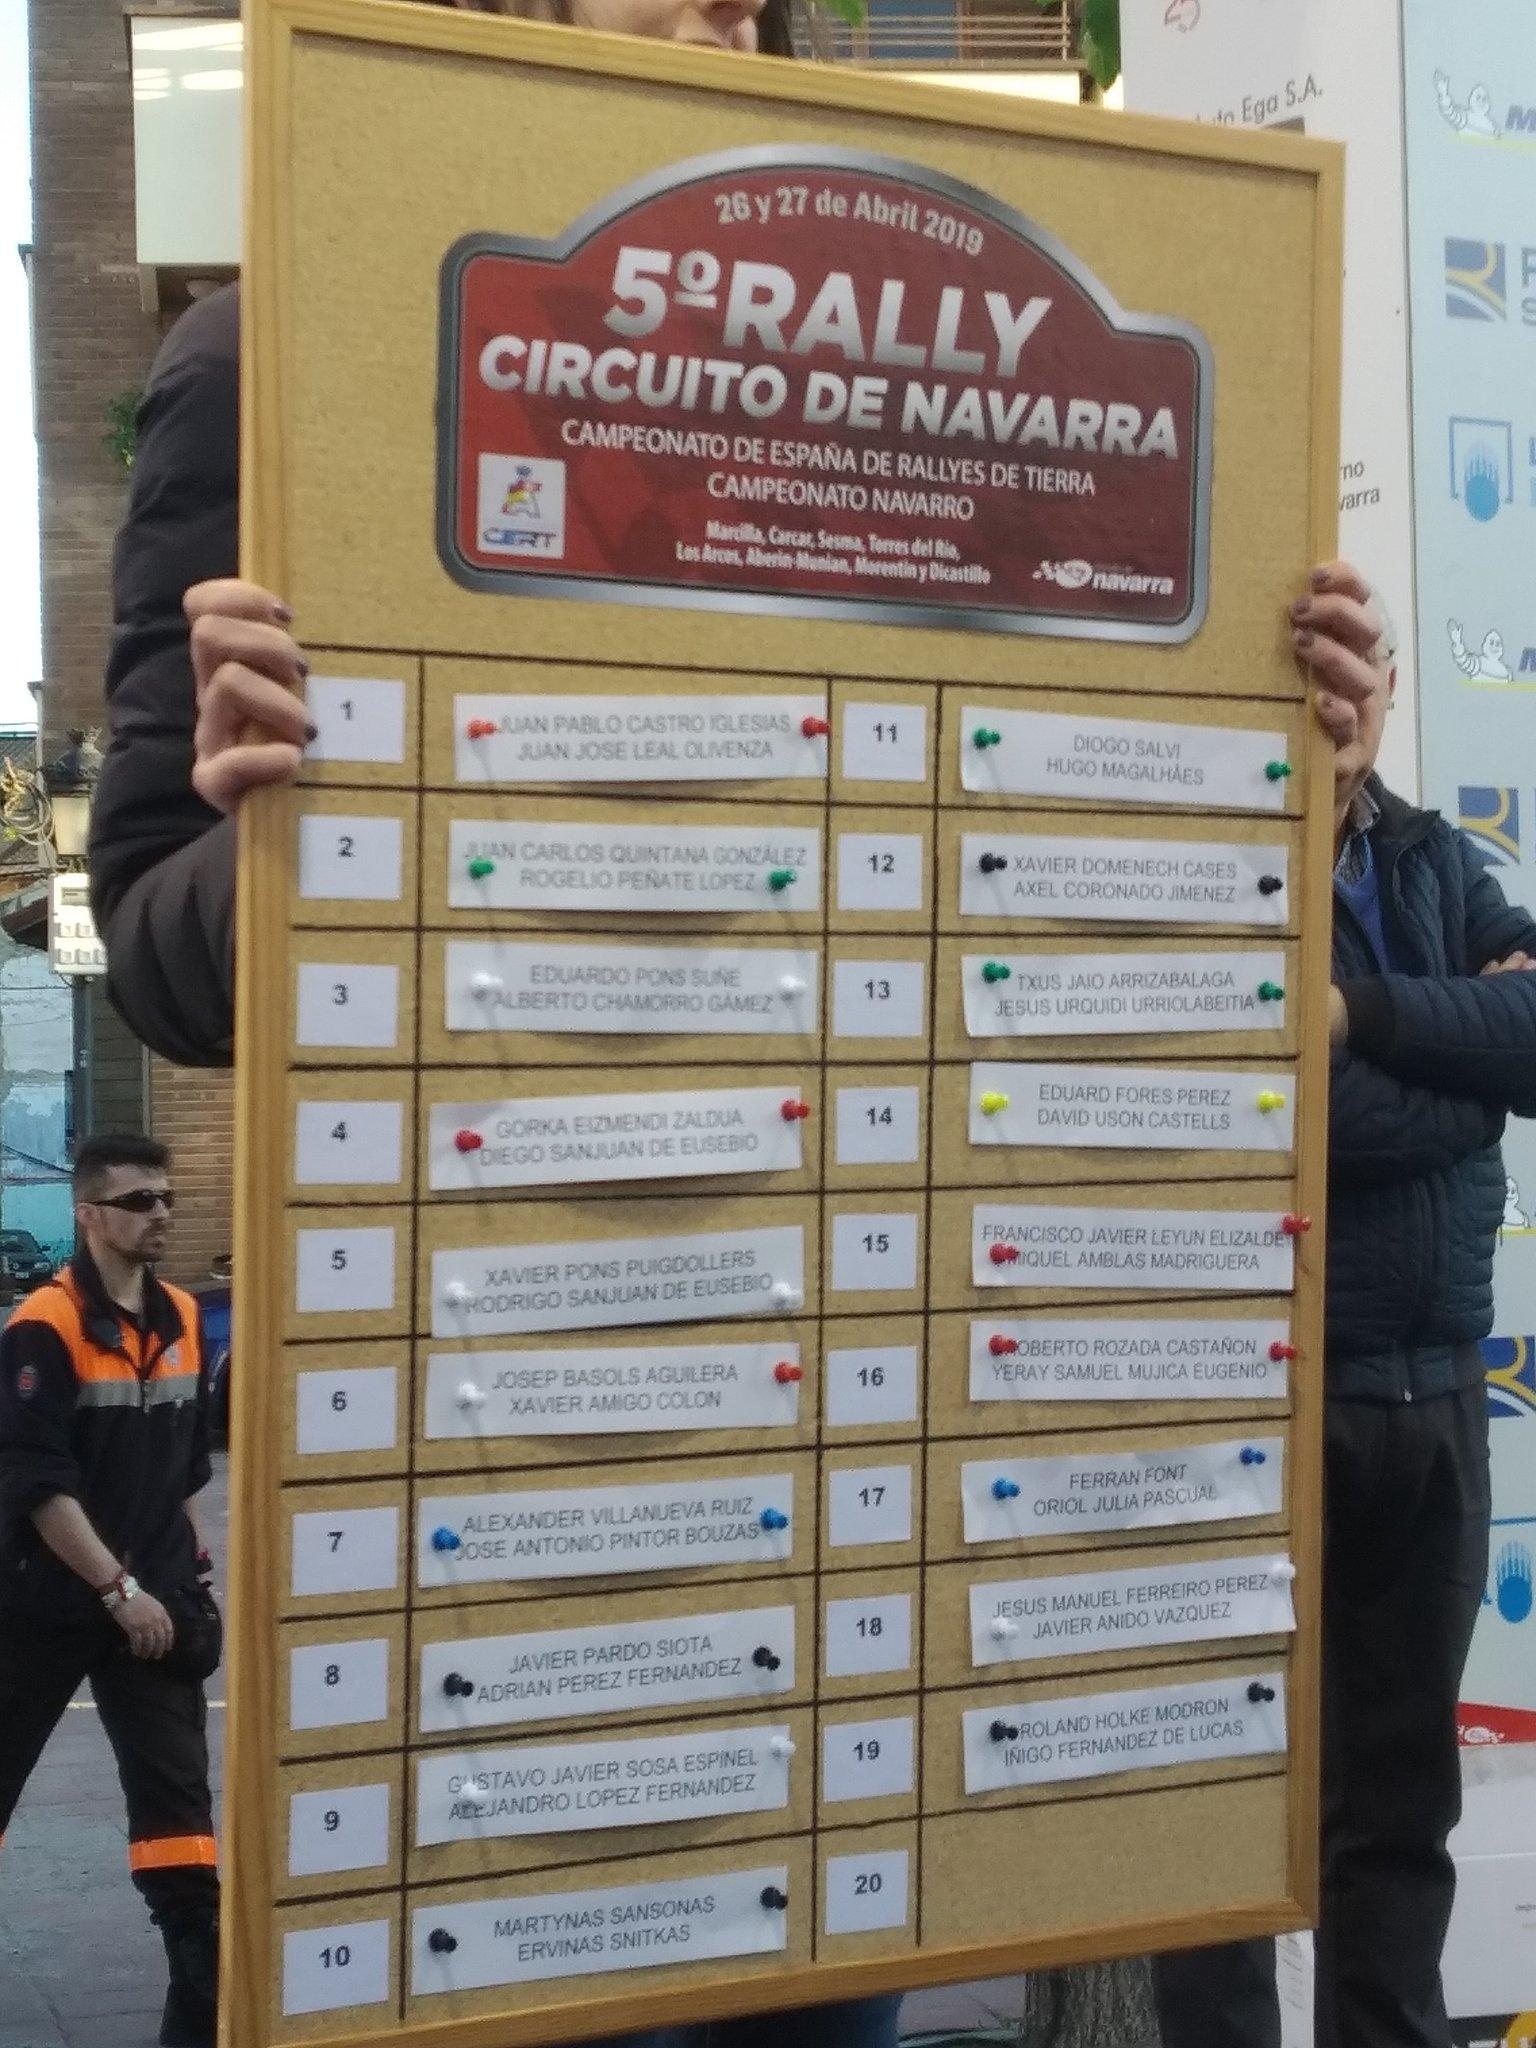 CERT: 5º Rallye de Tierra Circuito de Navarra [26-27 de Abril] D5GWTWAWkAUZjSj